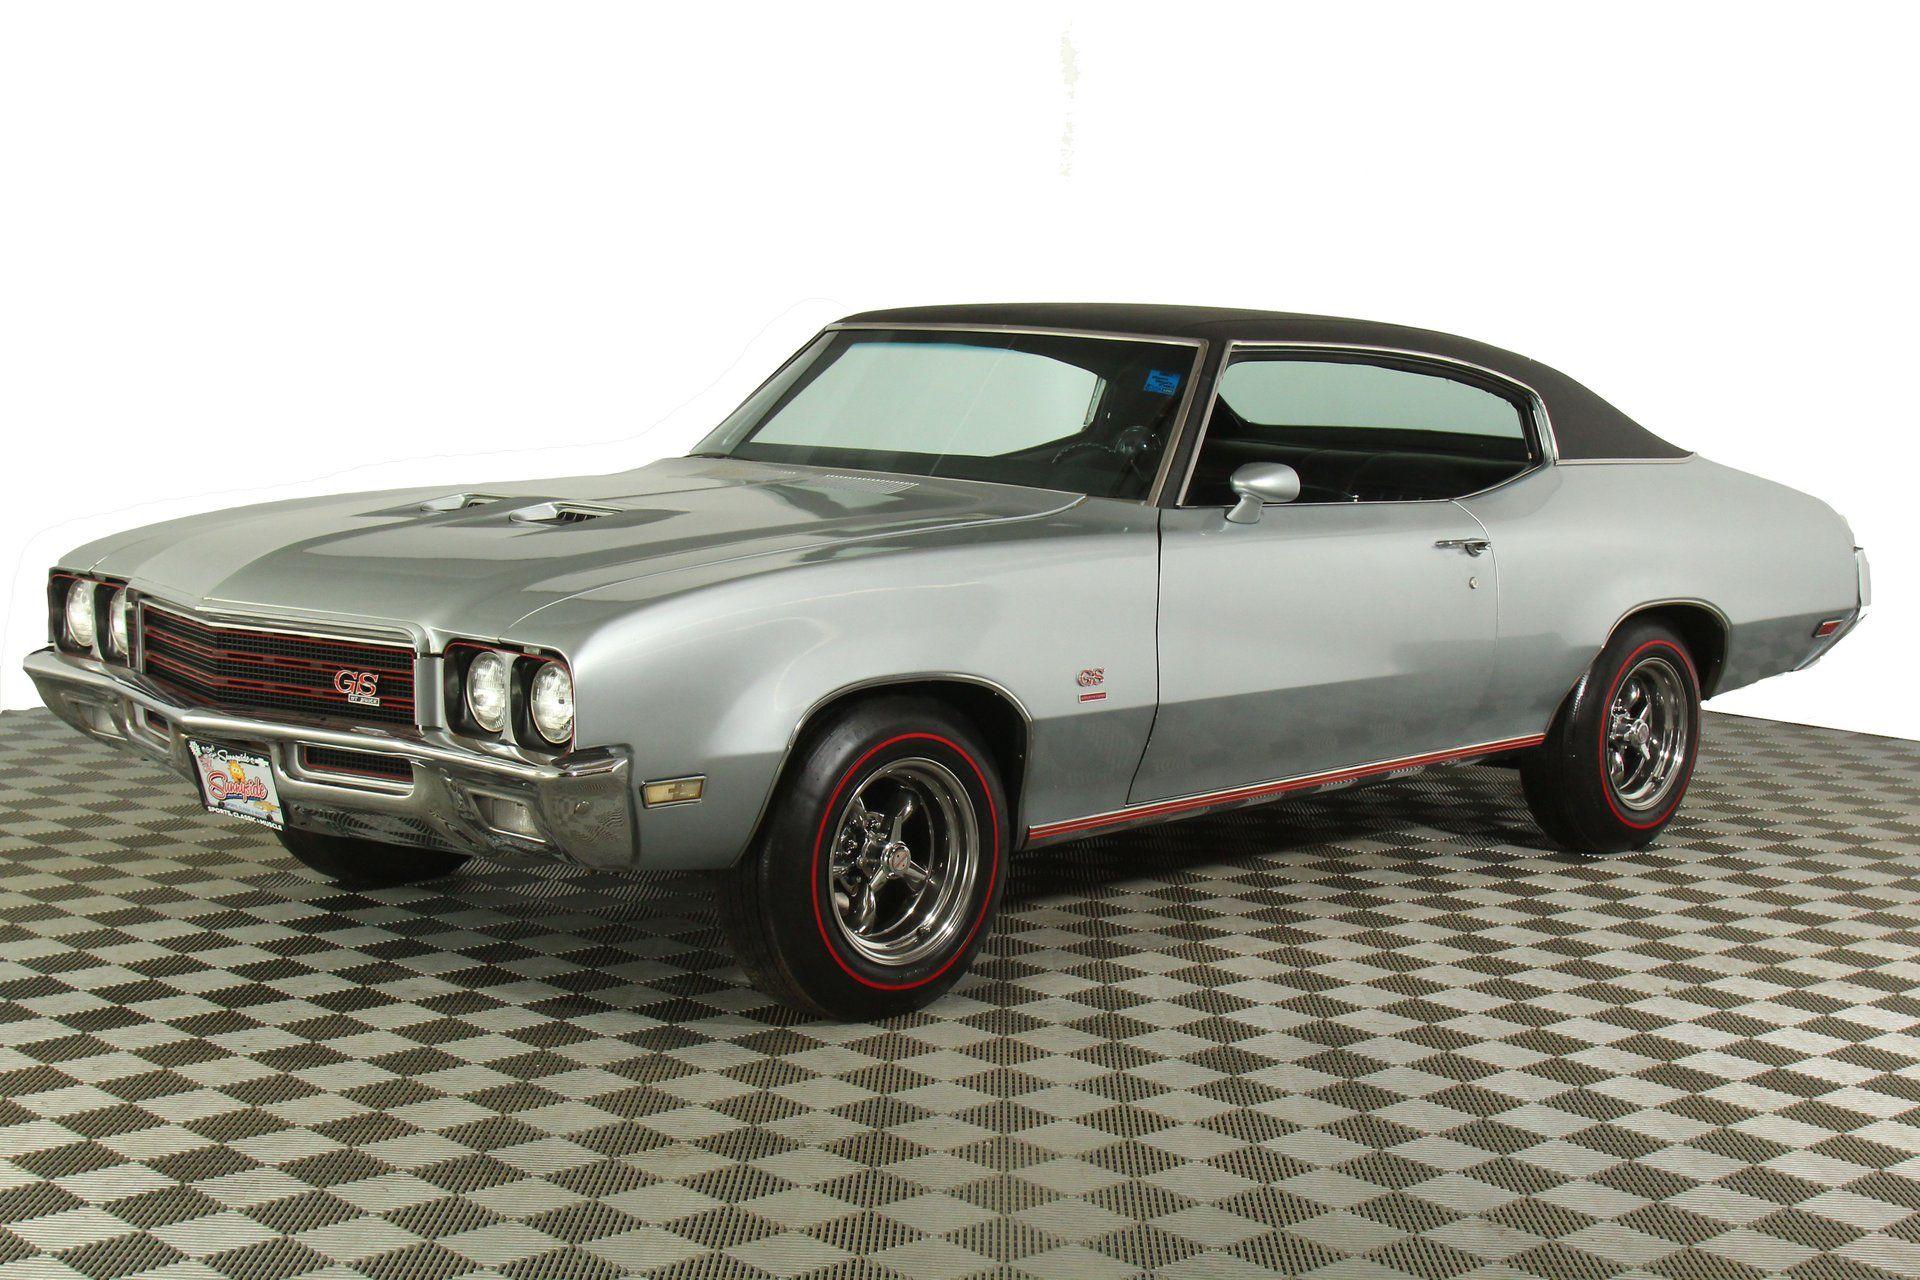 "<img src=""1971-buick-gs.jpeg"" alt=""A 1971 Buick GS up for grabs"">"